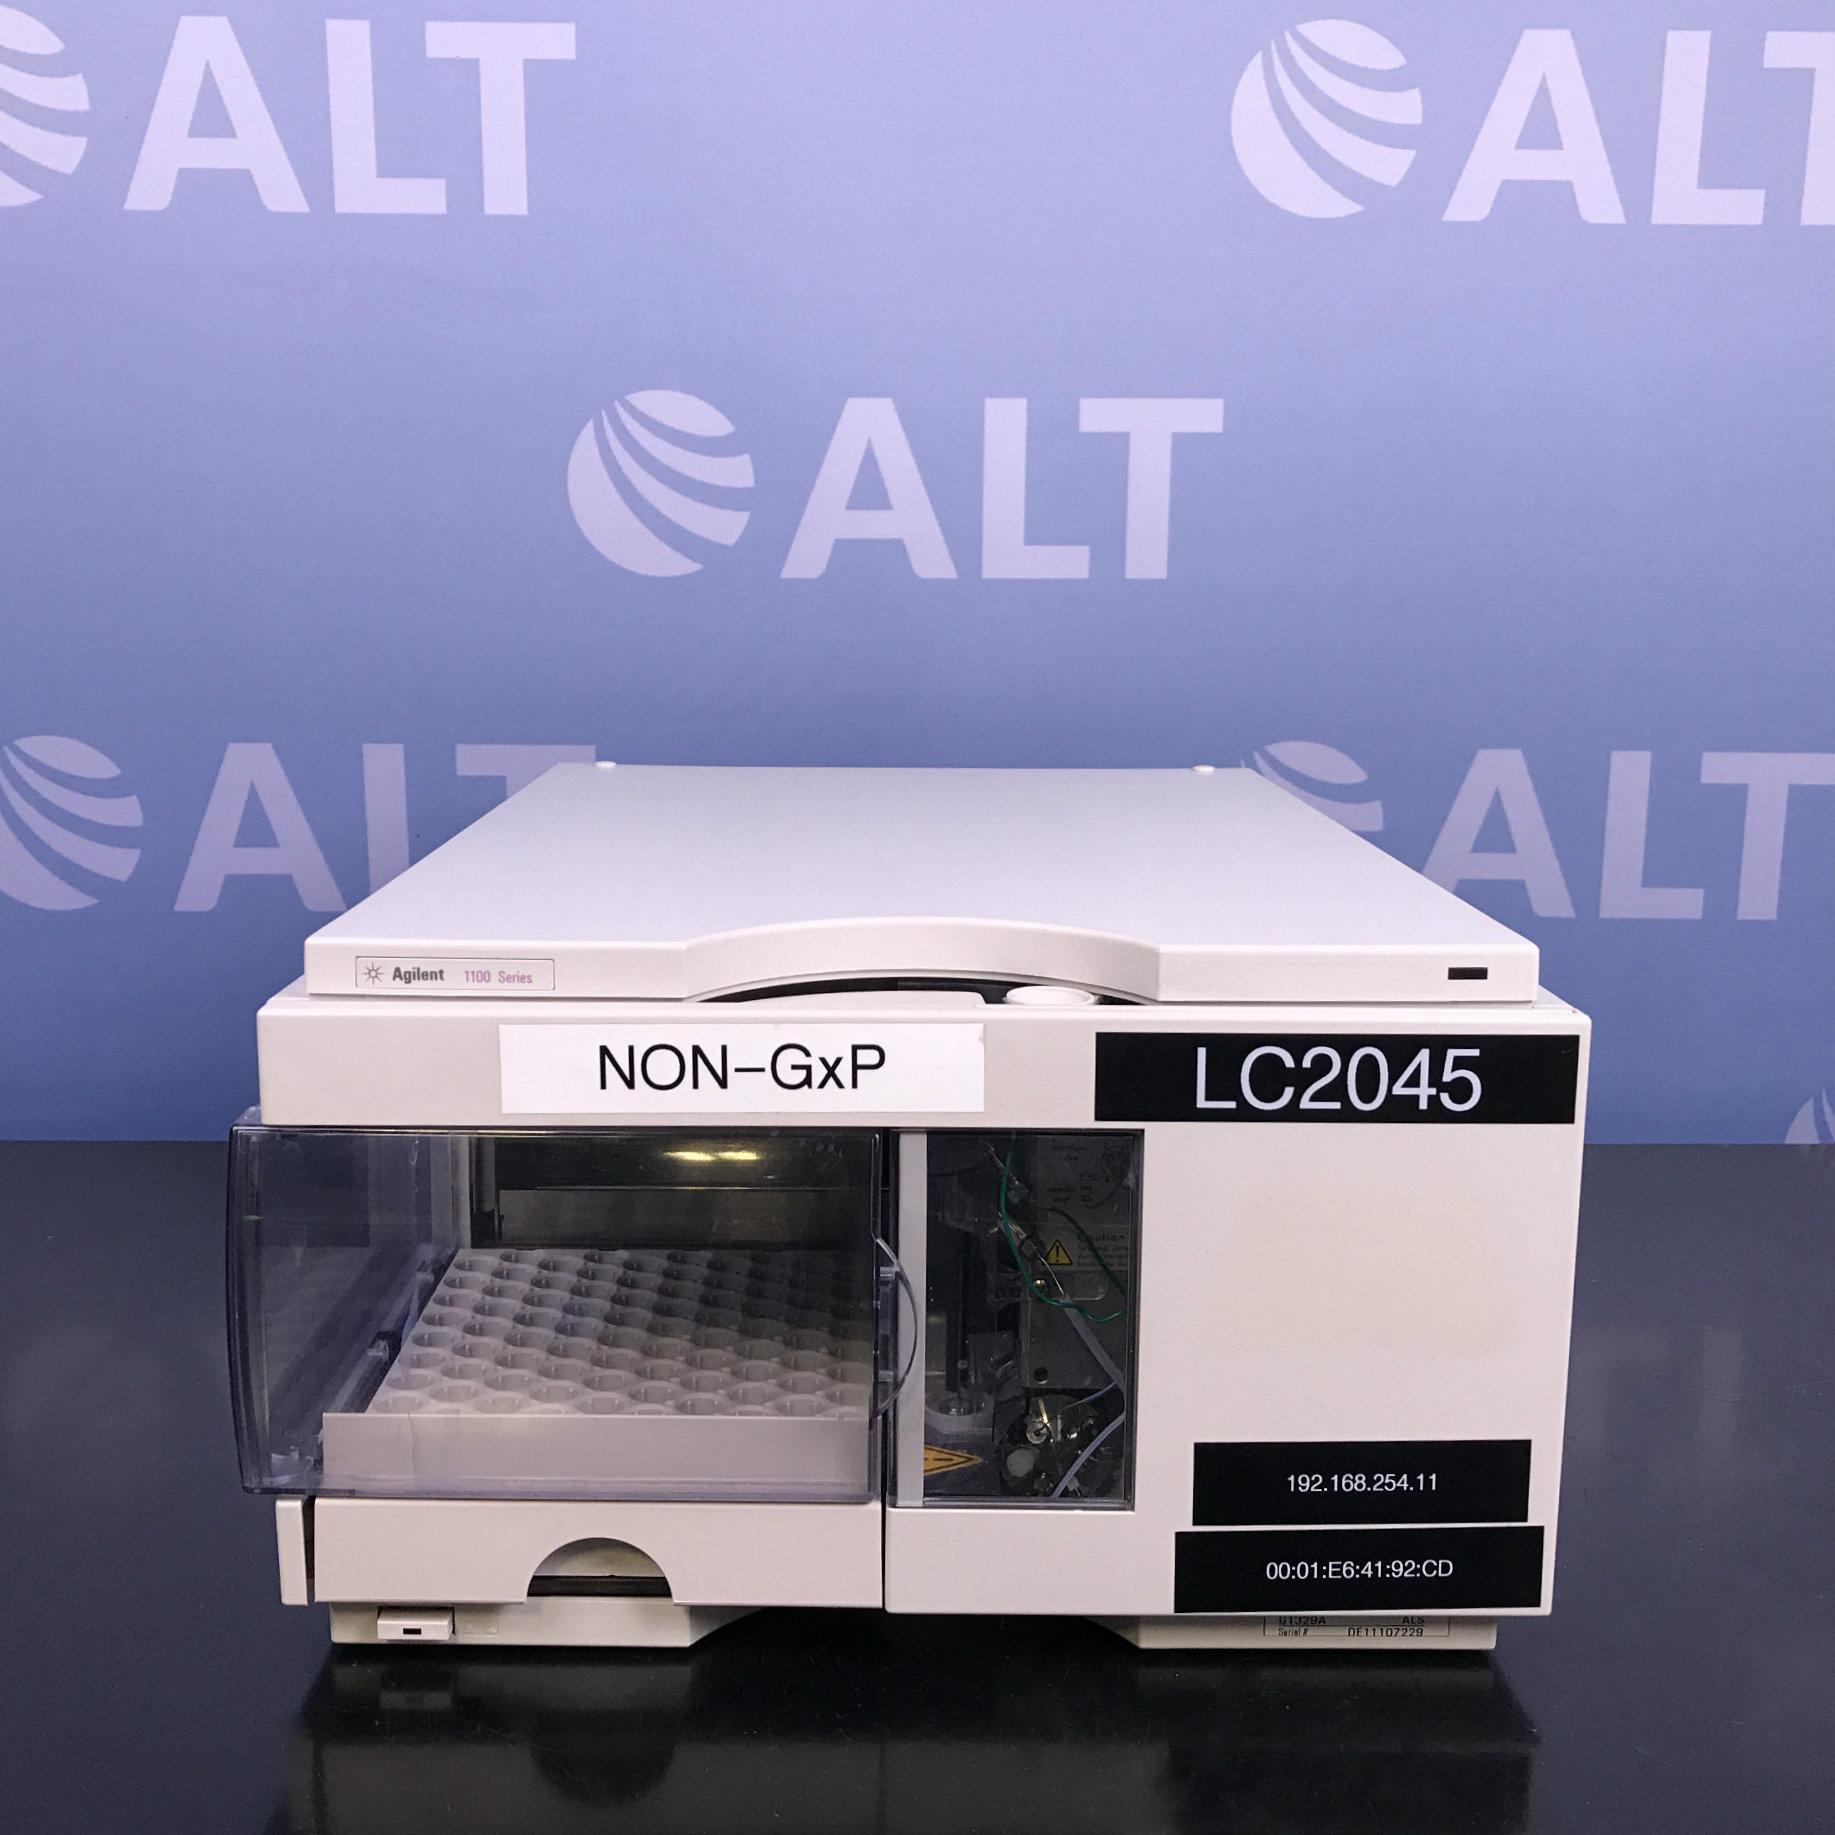 Agilent Technologies 1100 Series G1329A ALS Autosampler Image